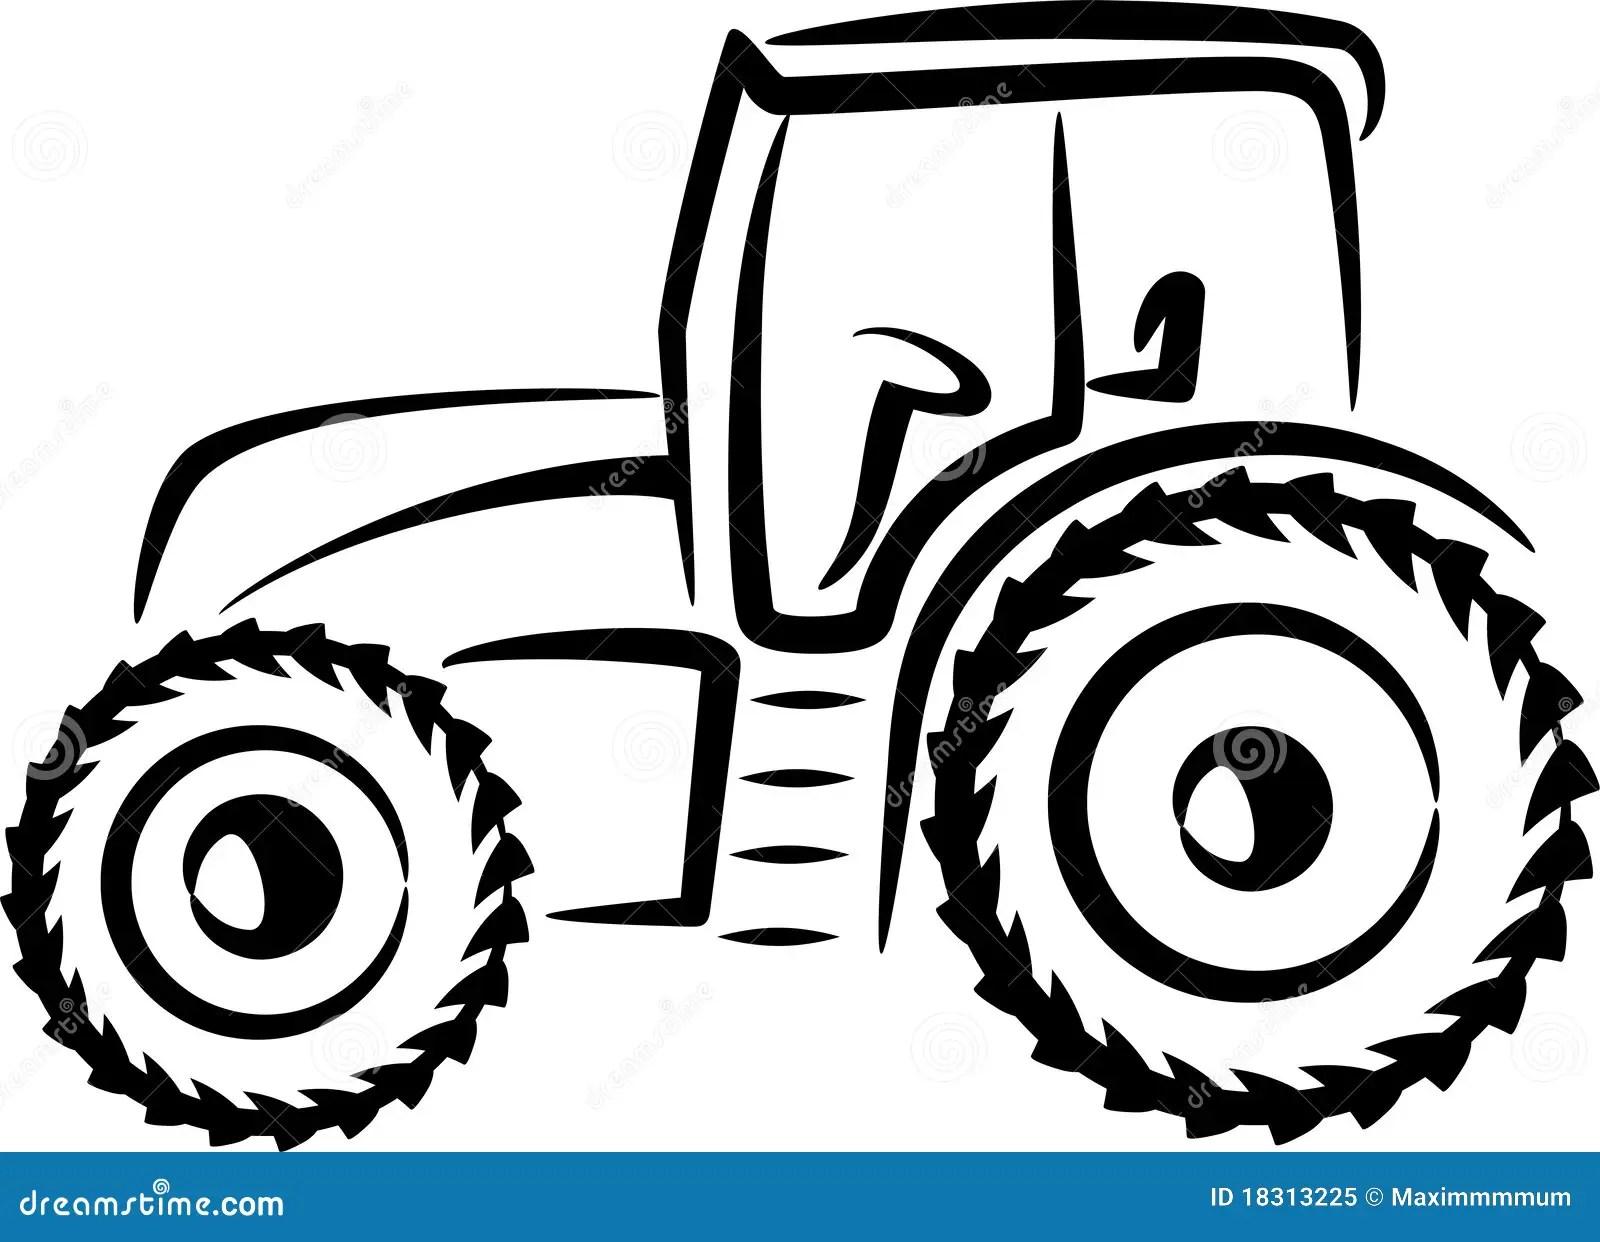 Abbildung Mit Einem Traktor Vektor Abbildung